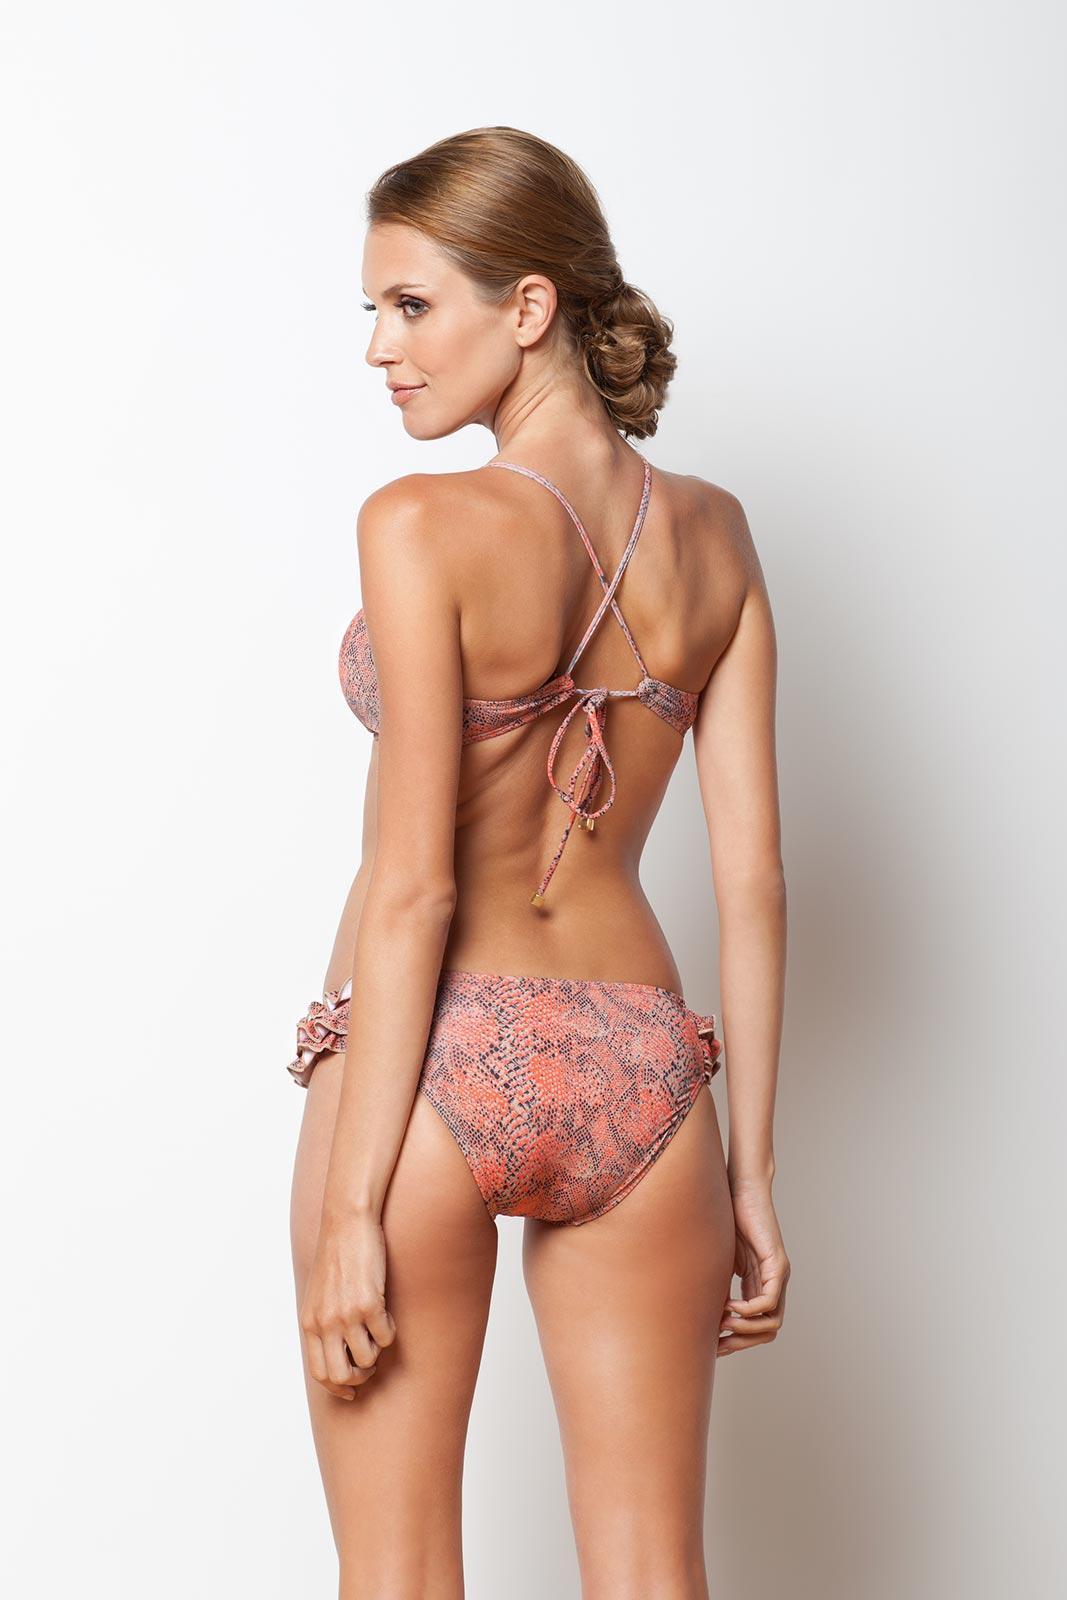 Ariel Tweto Nude  Hot Girl Hd Wallpaper-2156